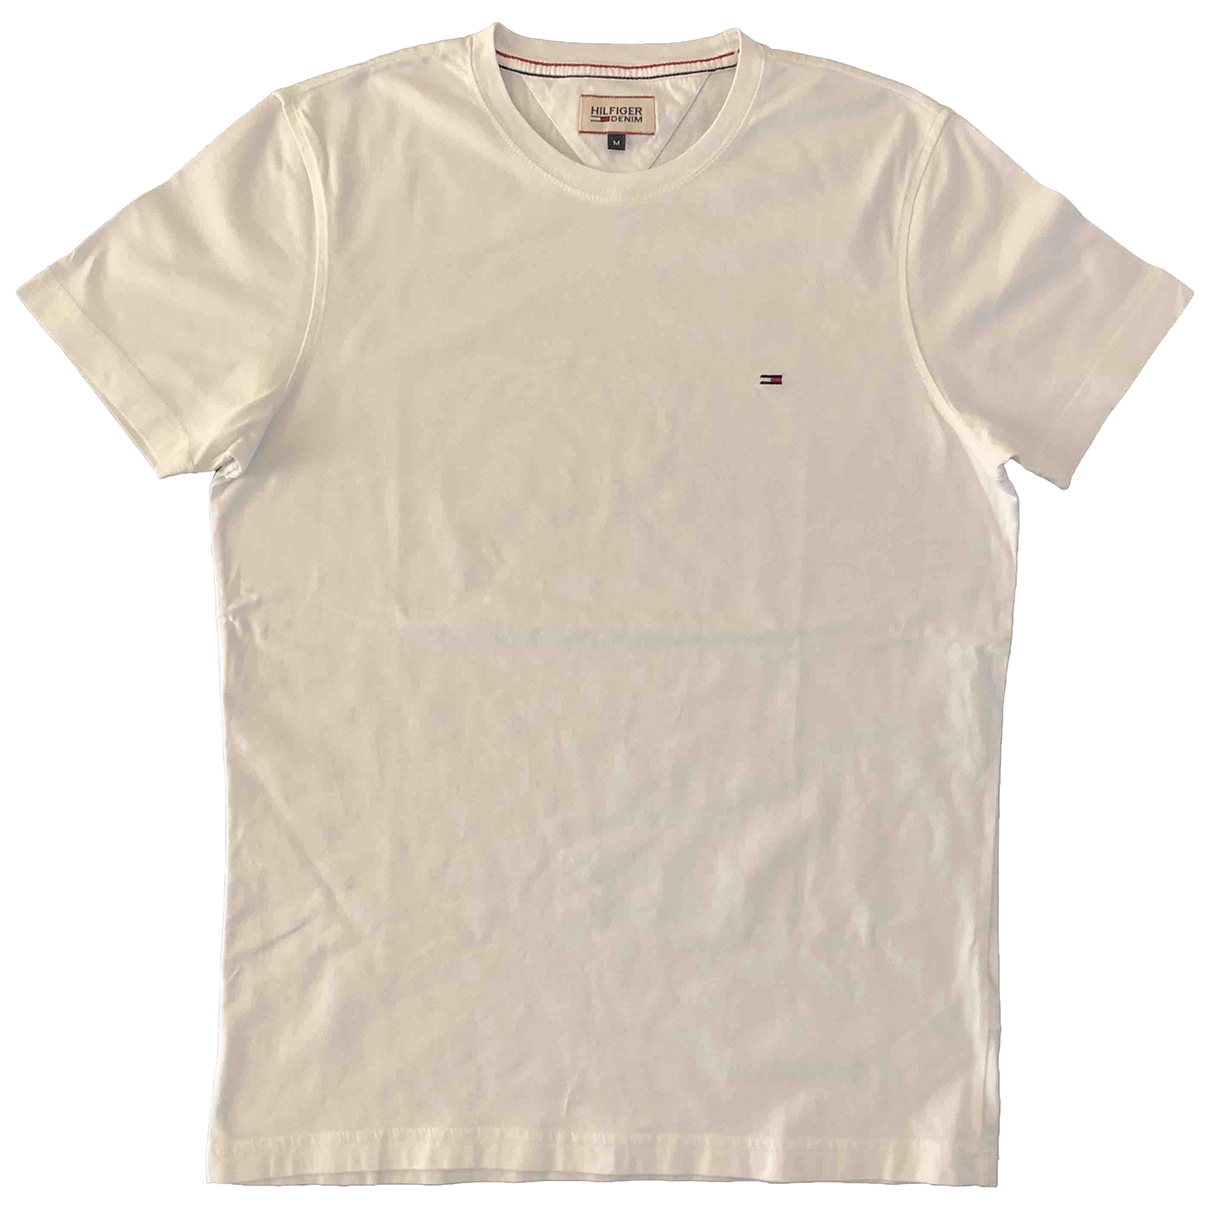 Tommy Hilfiger \N White Cotton T-shirts for Men M International